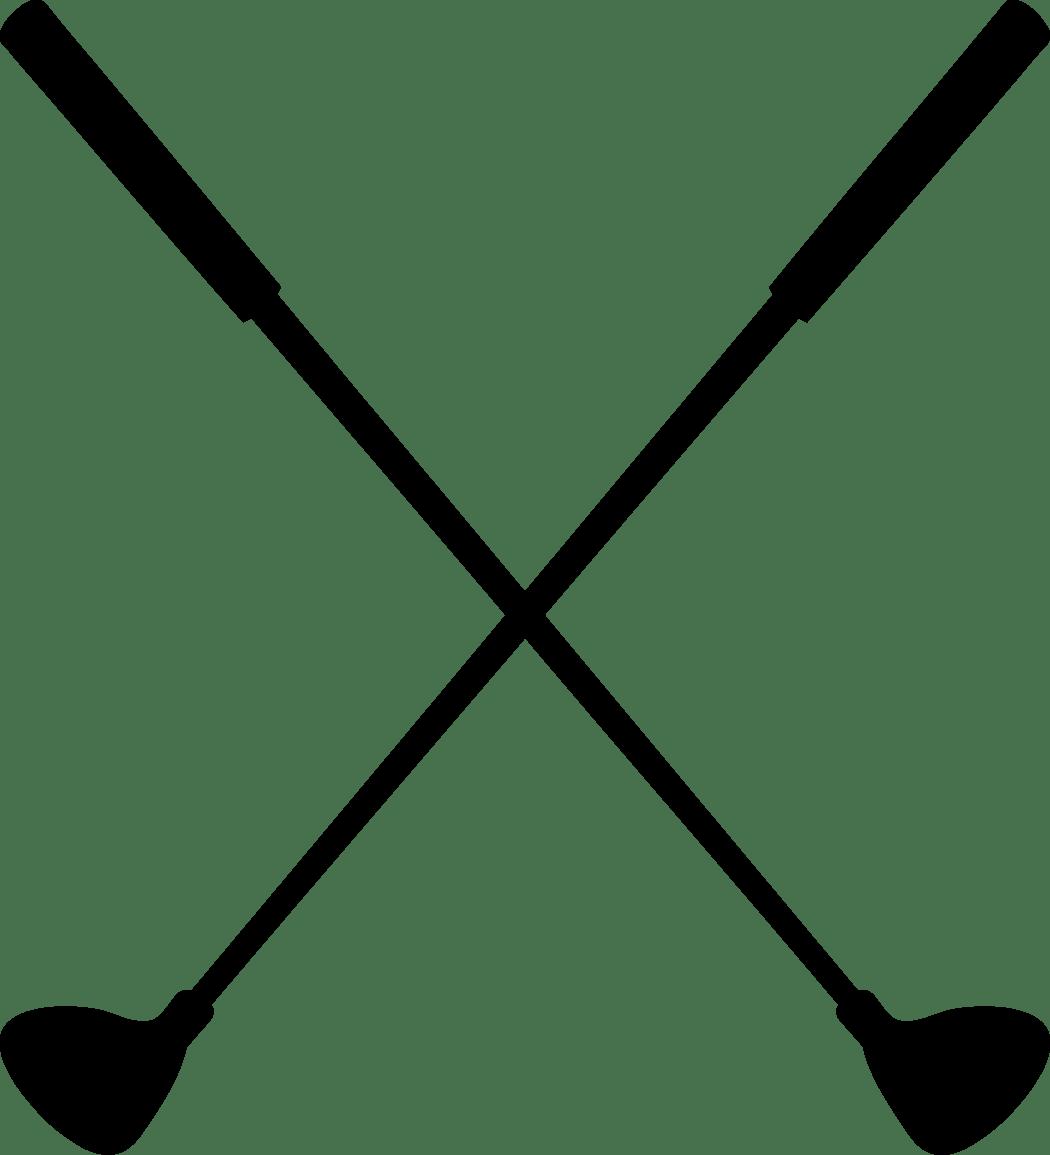 Crossed Golf Club Clipart Clipart Panda